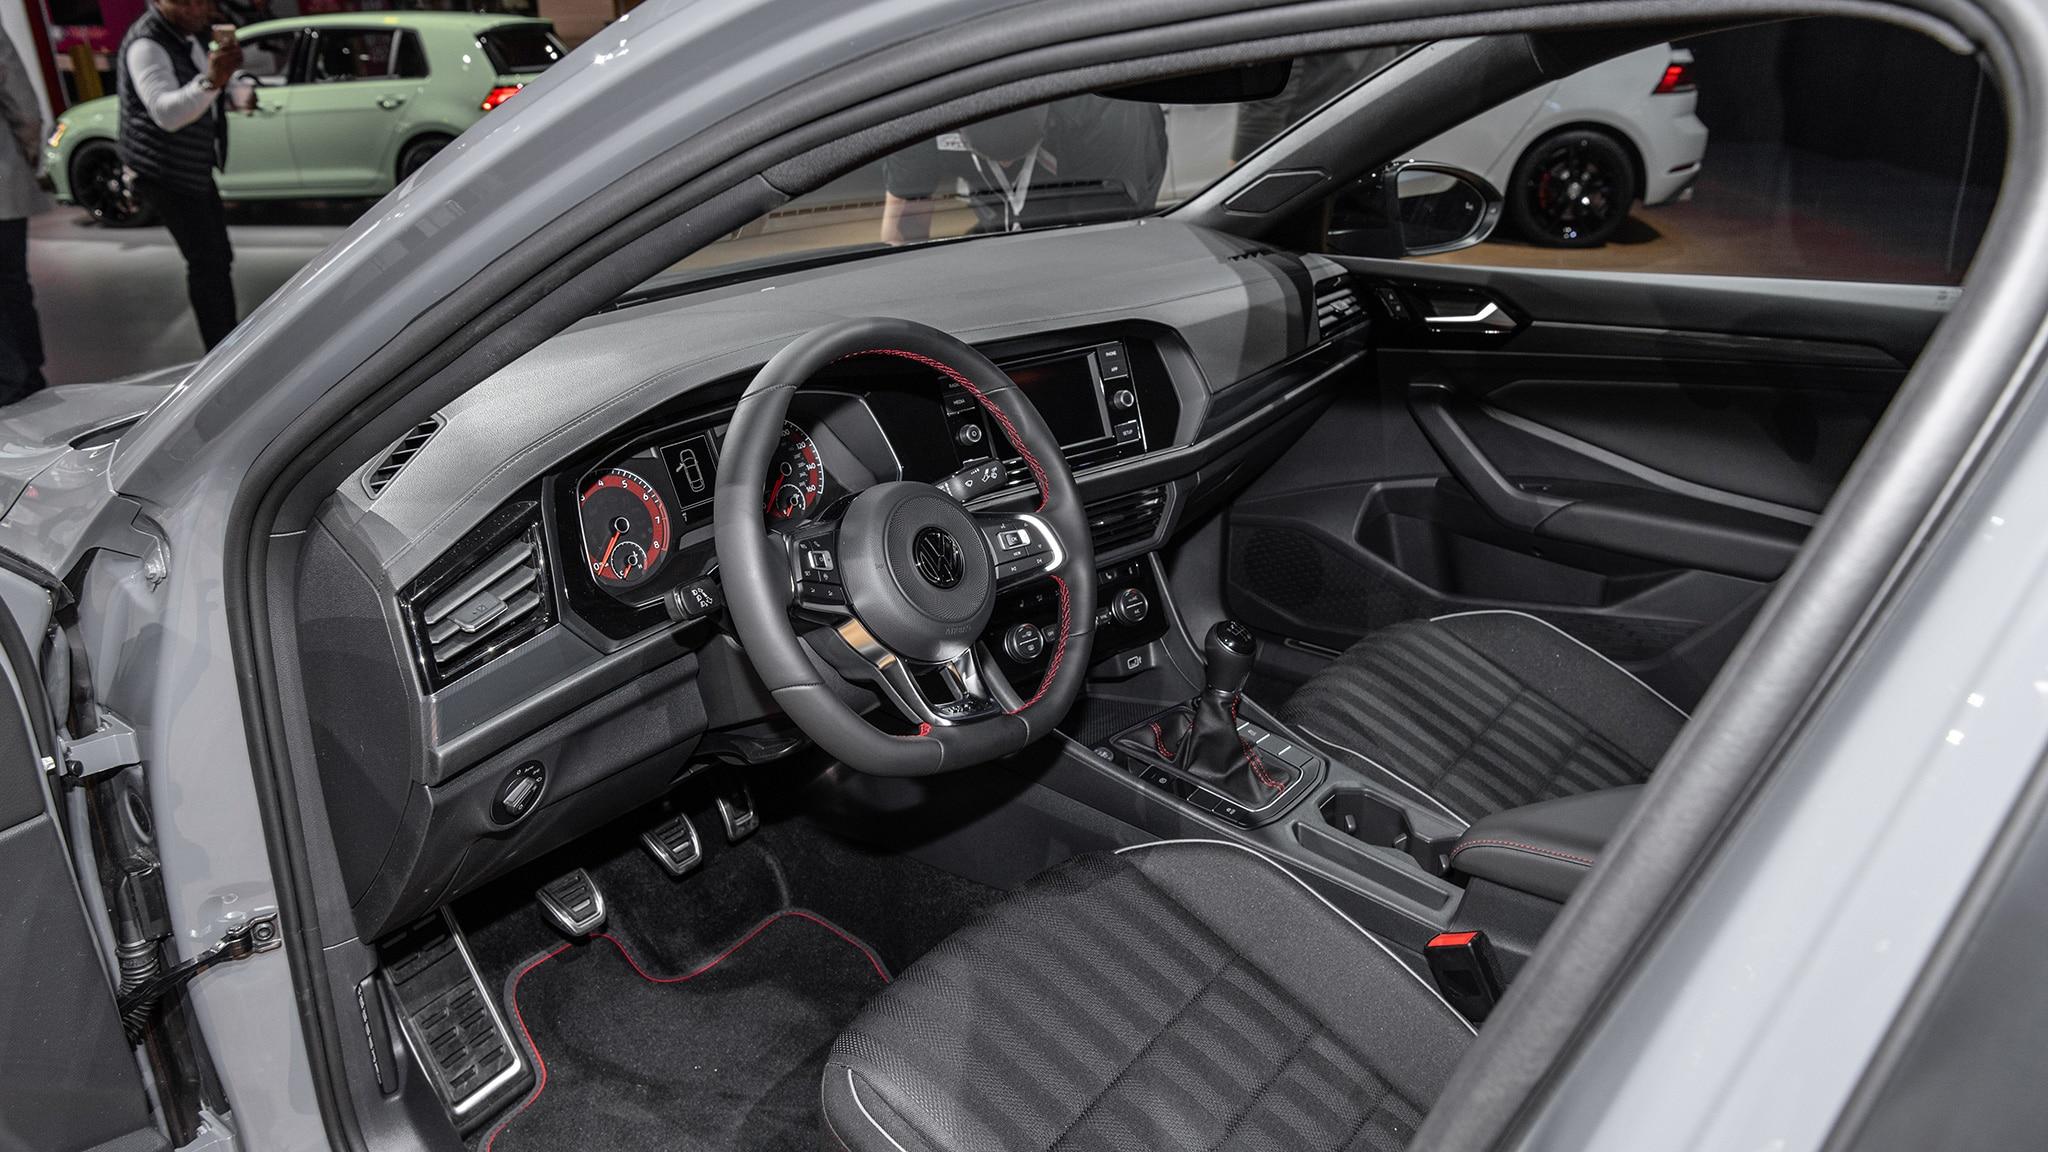 2019 VW Jetta GLI Photos and Specs: Following the GTI Template | Automobile Magazine